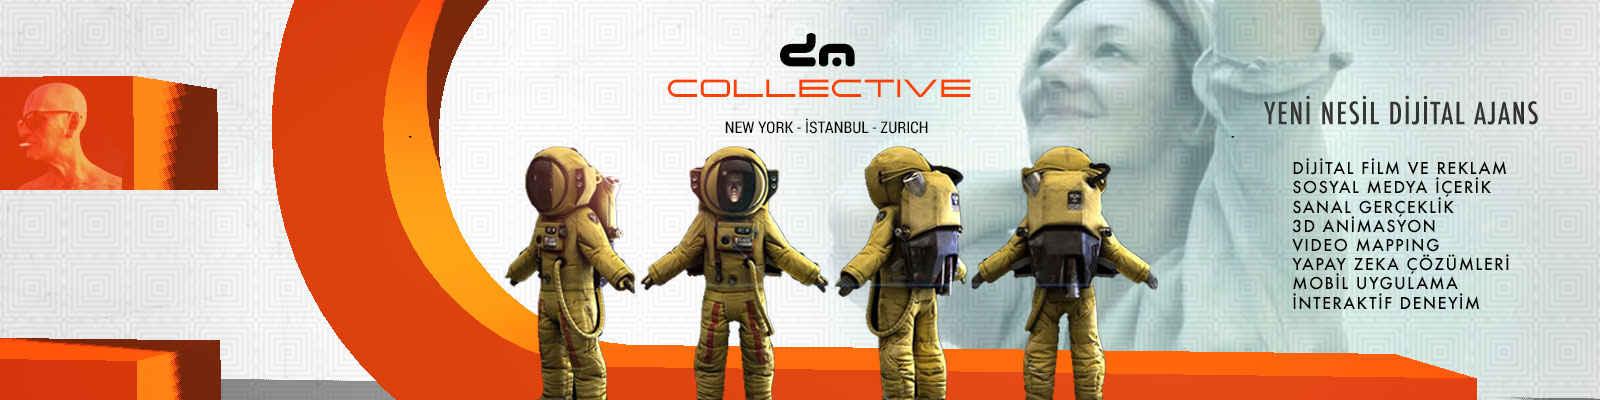 DMCollective banner fotograf